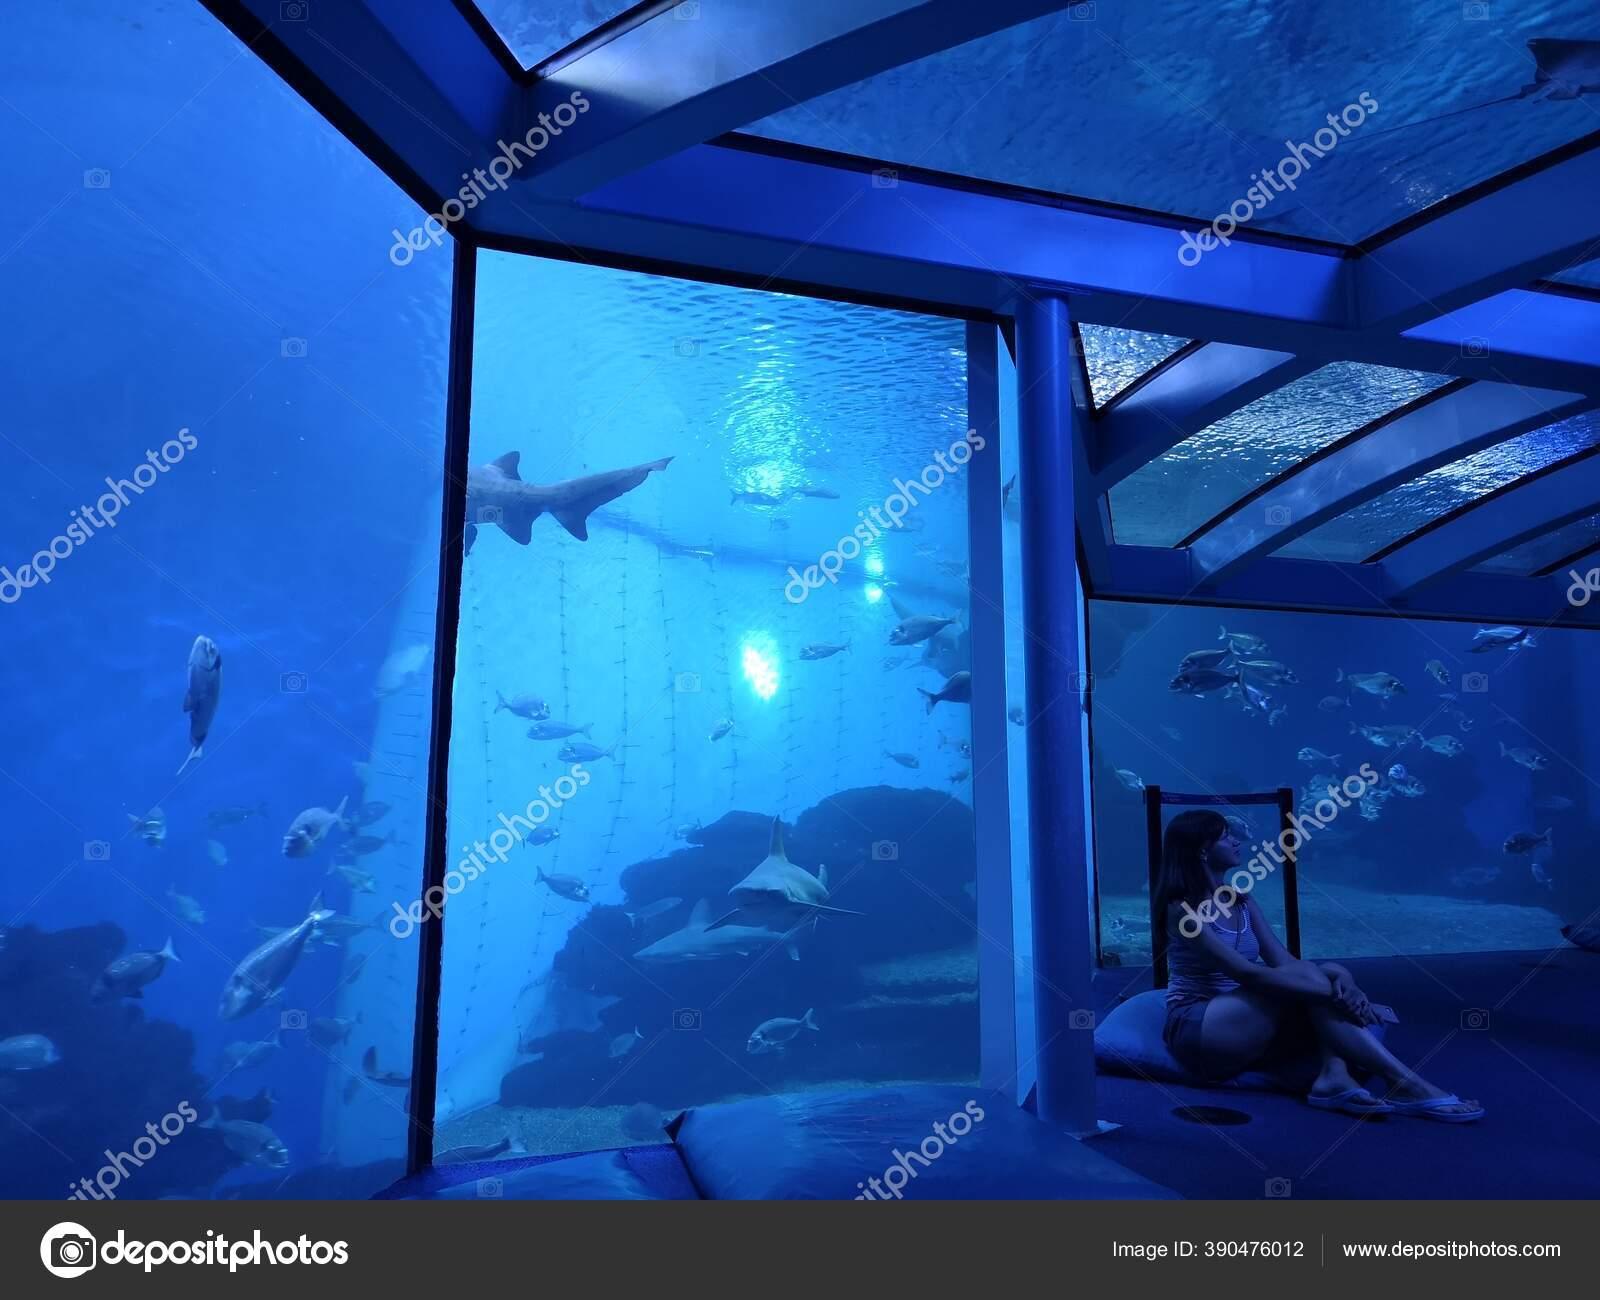 Siluet Wanita Depan Akuarium Besar Foto Biru Tua Dengan Ikan Stok Foto C Freedommaster 390476012